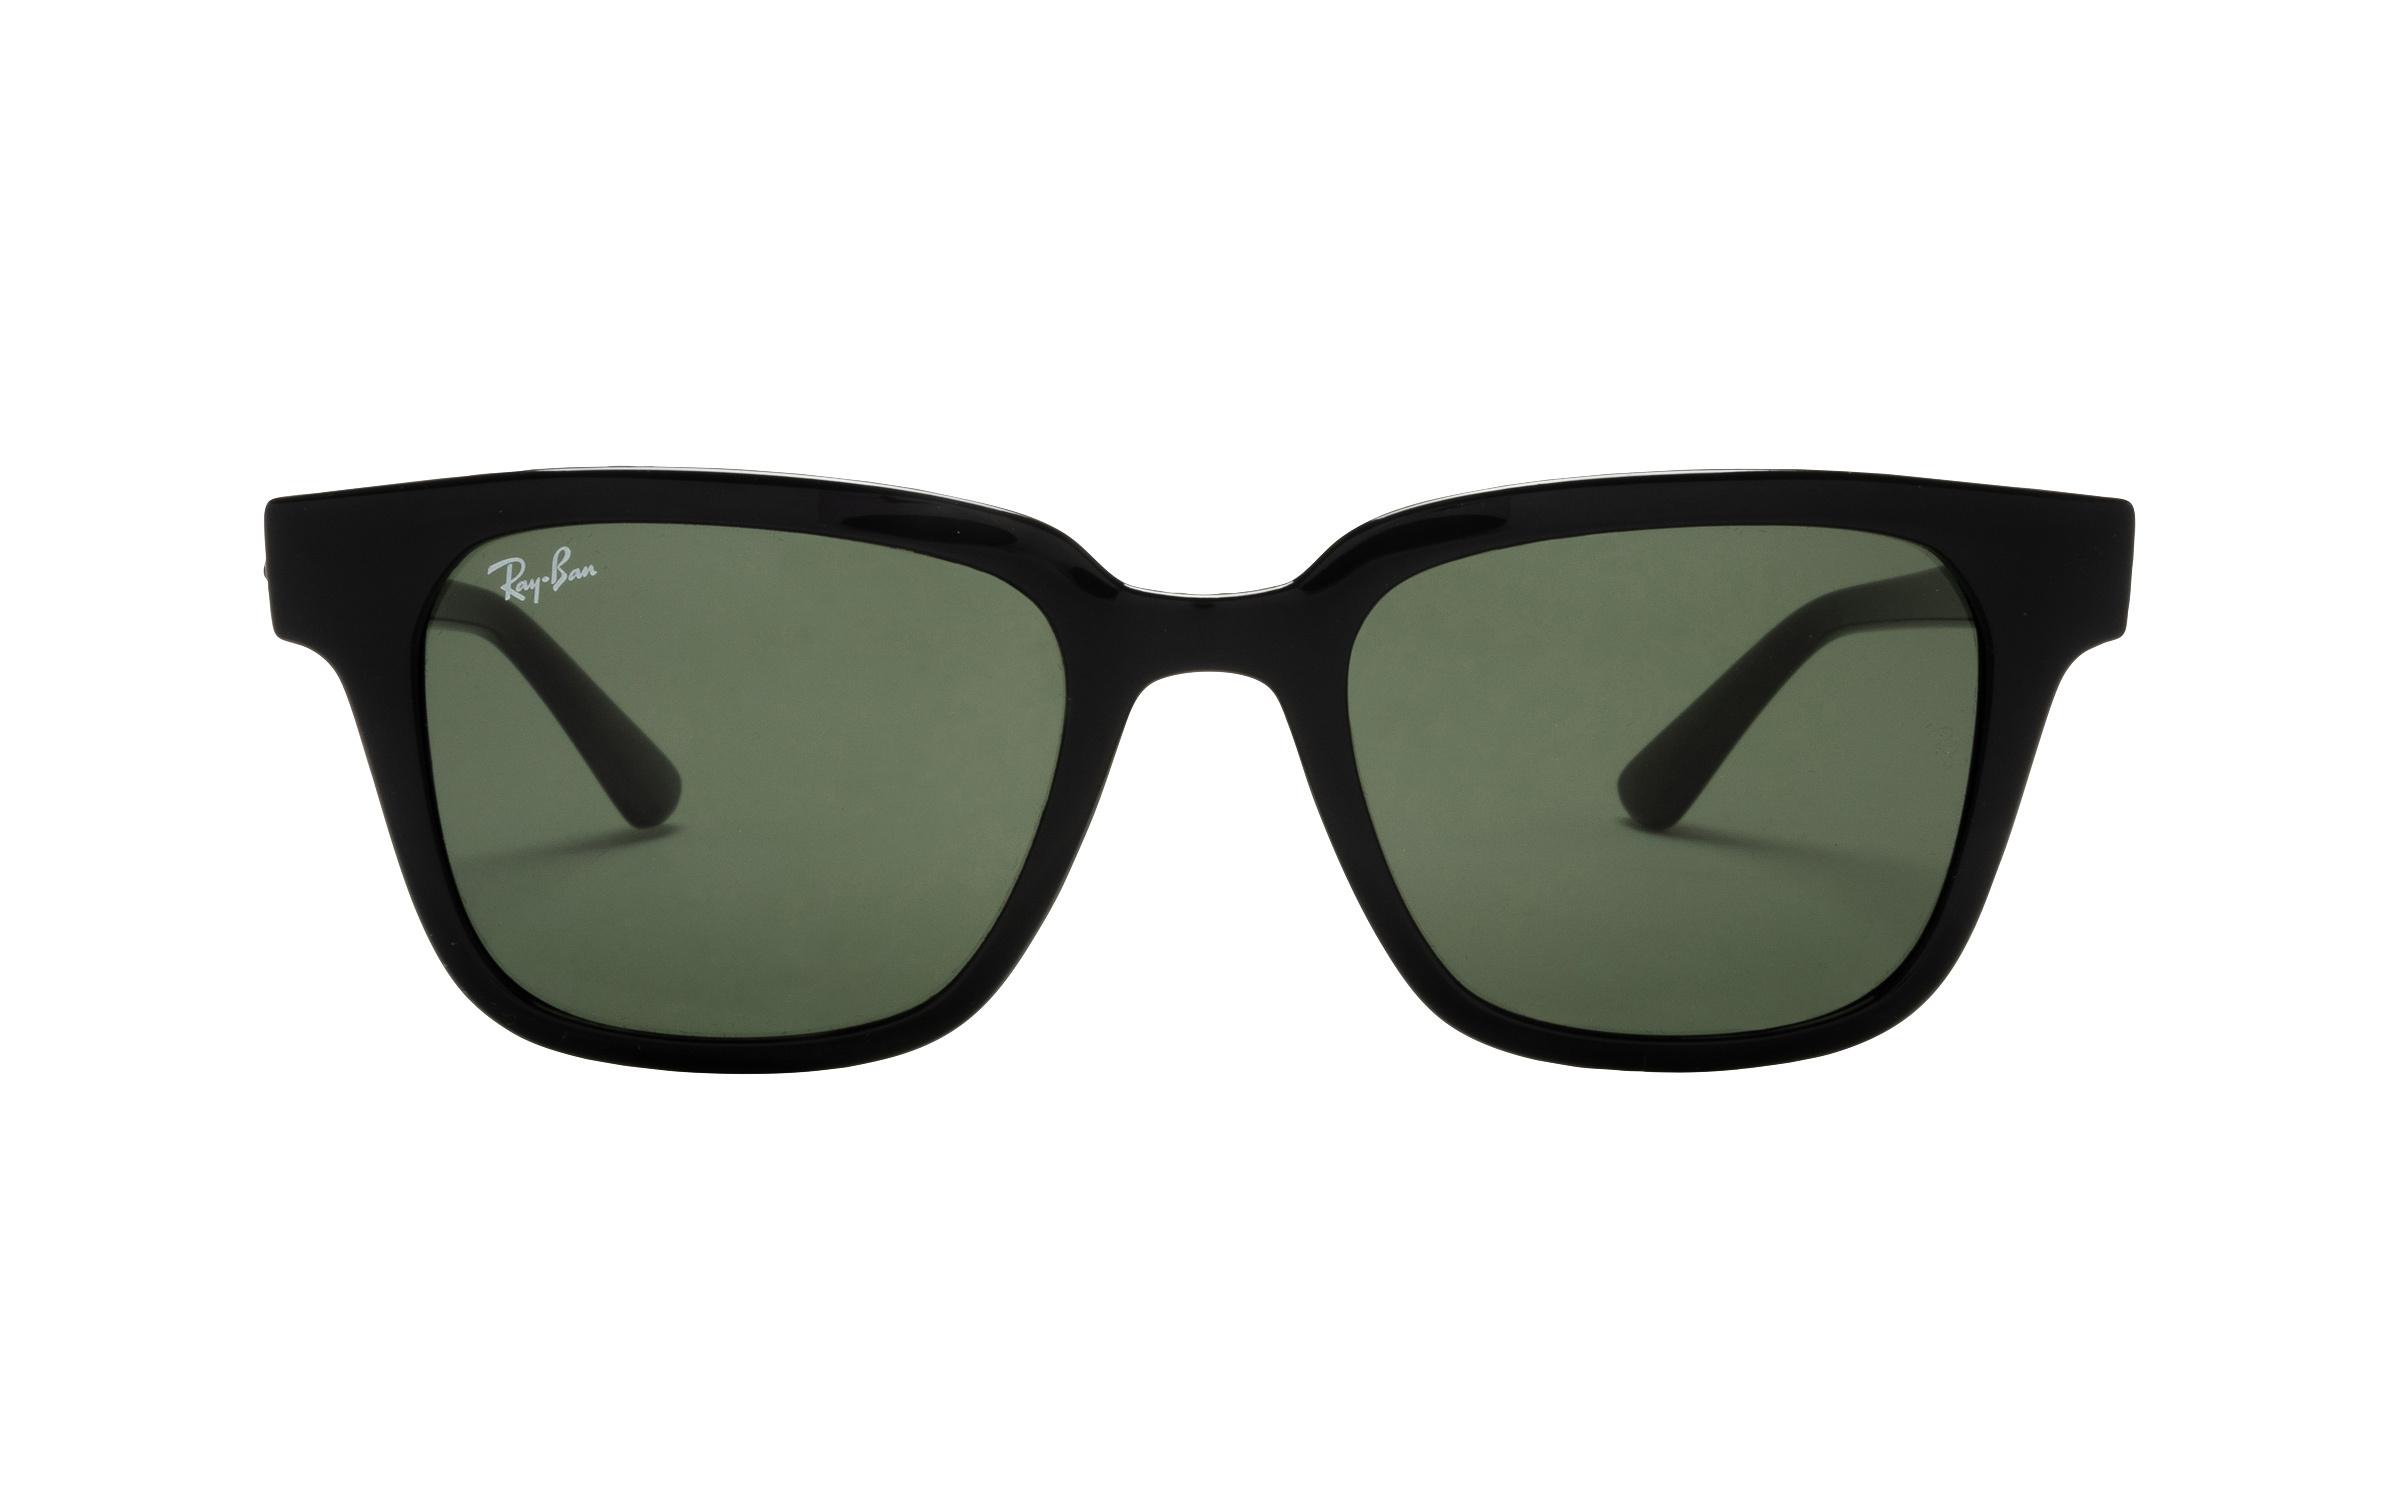 coastal.com - RayBan Ray-Ban RB4323 601/31 51 Sunglasses in Black – Online Coastal 134.00 USD